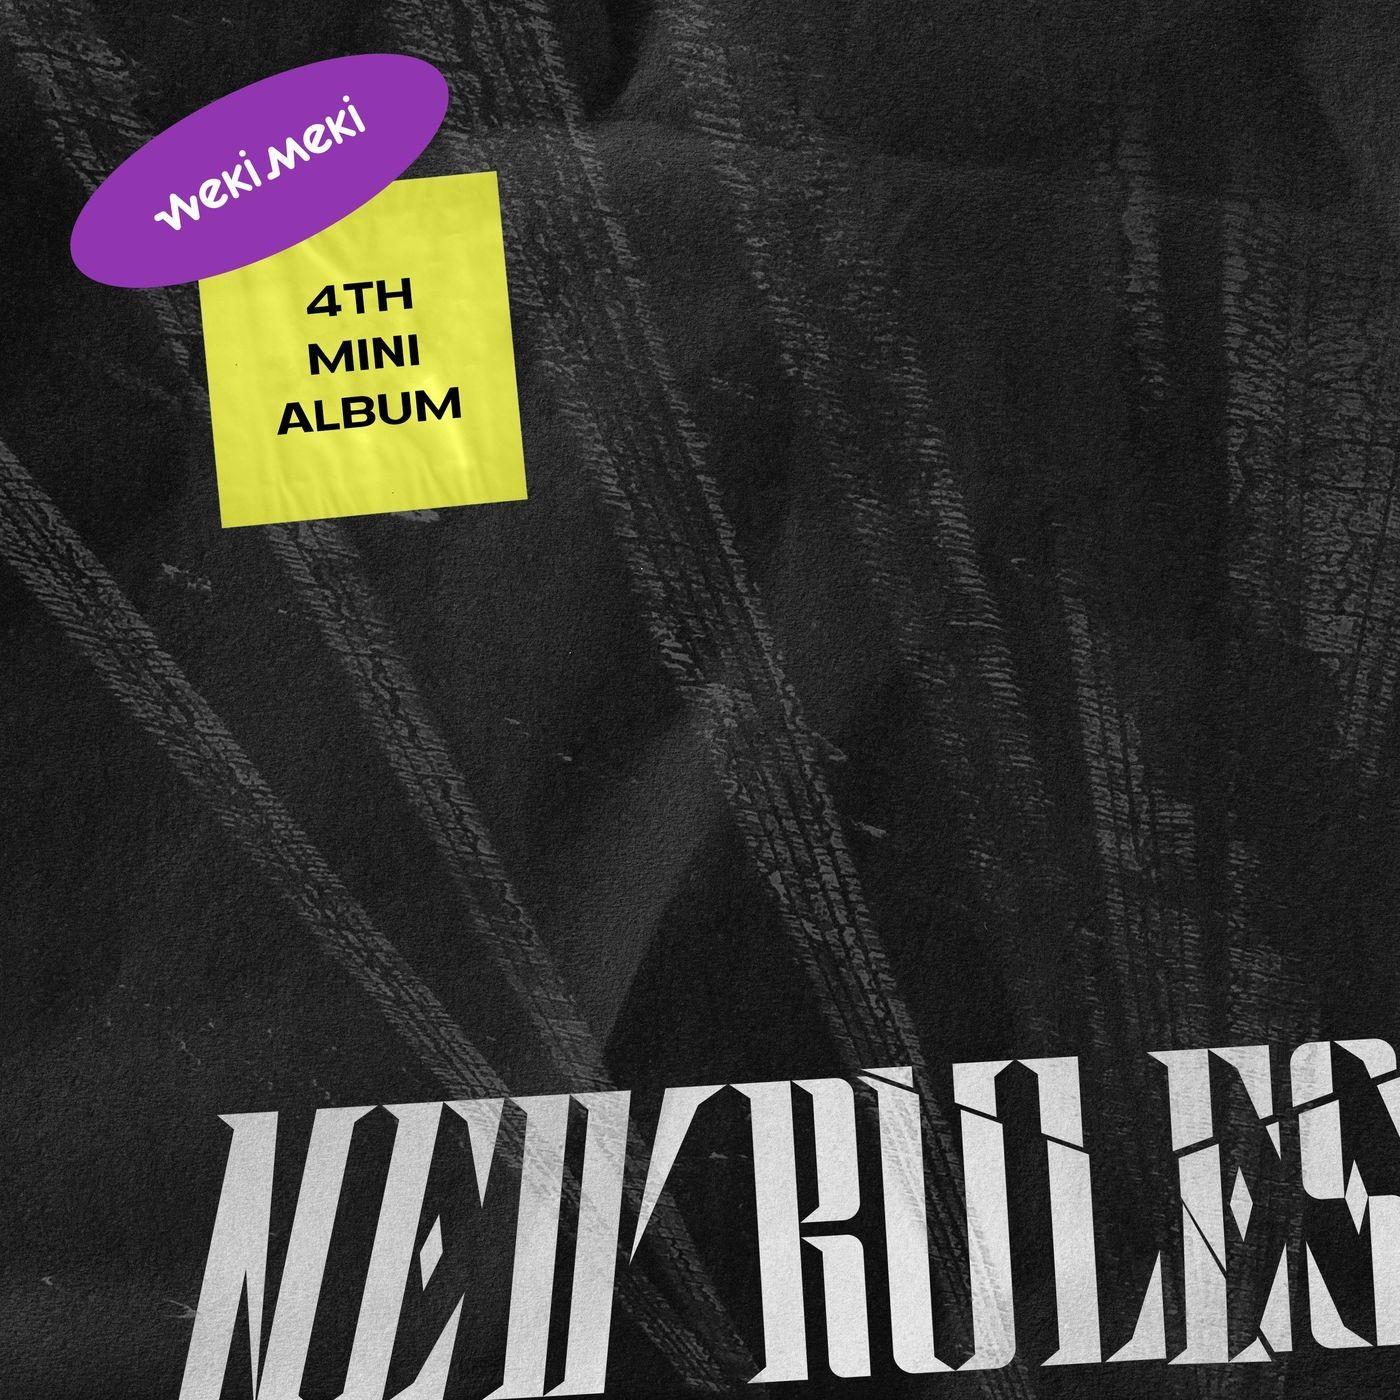 Weki Meki (위키미키) – NEW RULES [FLAC + MP3 320 / WEB] [2020.10.08]